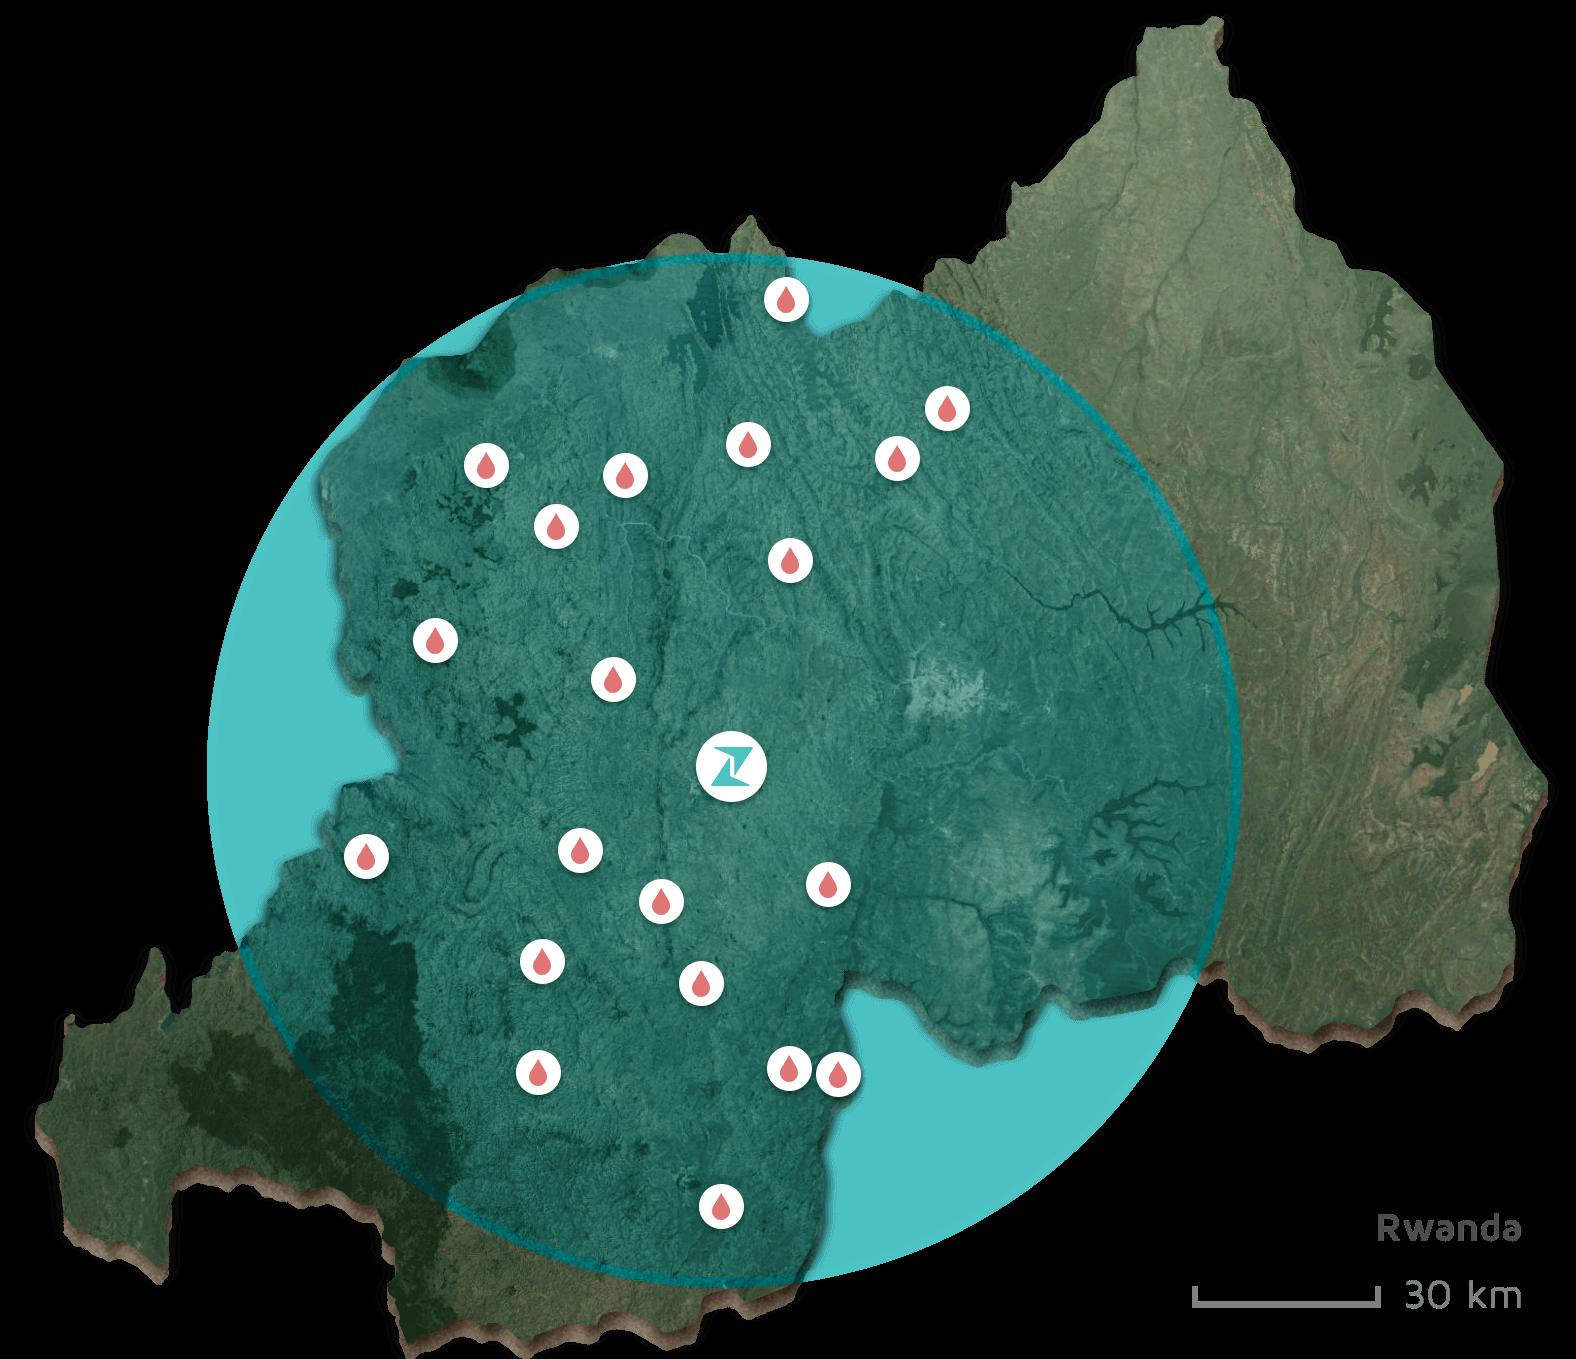 drone drop sites in Rwanda